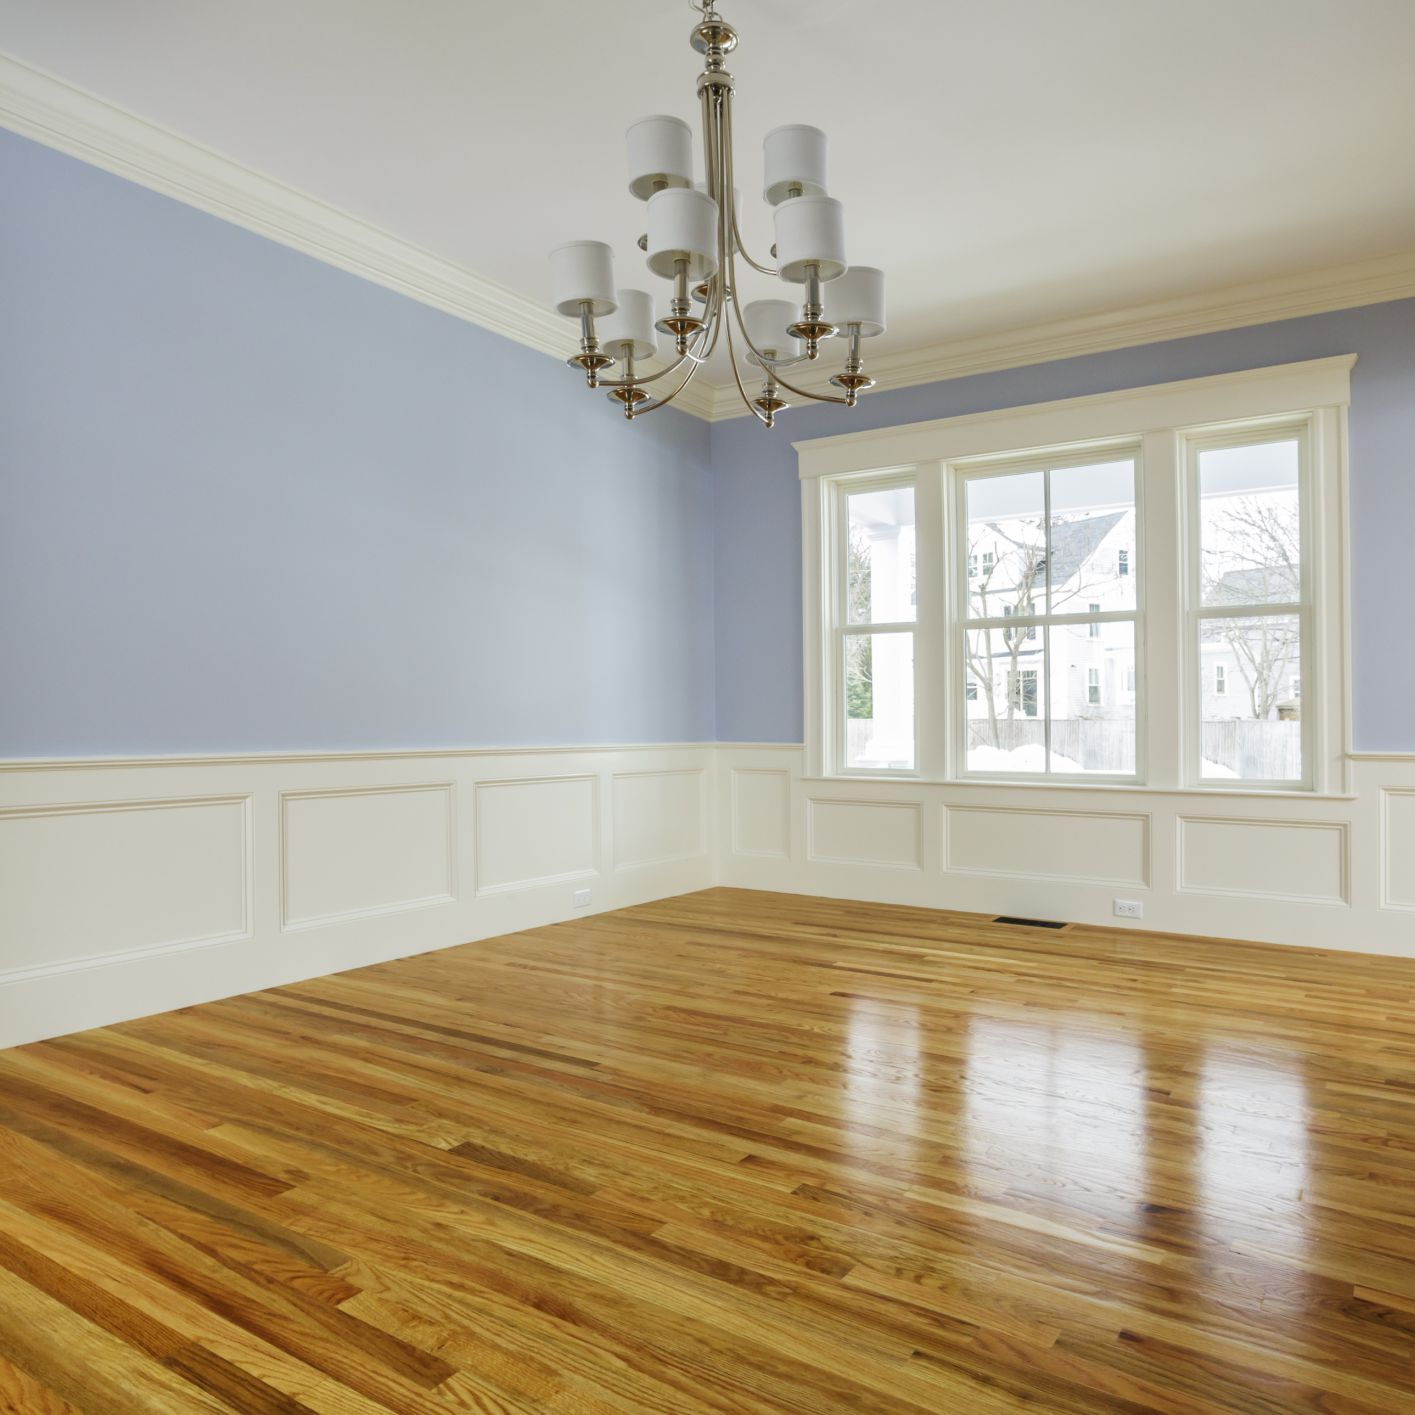 The Cost To Refinish Hardwood Floors